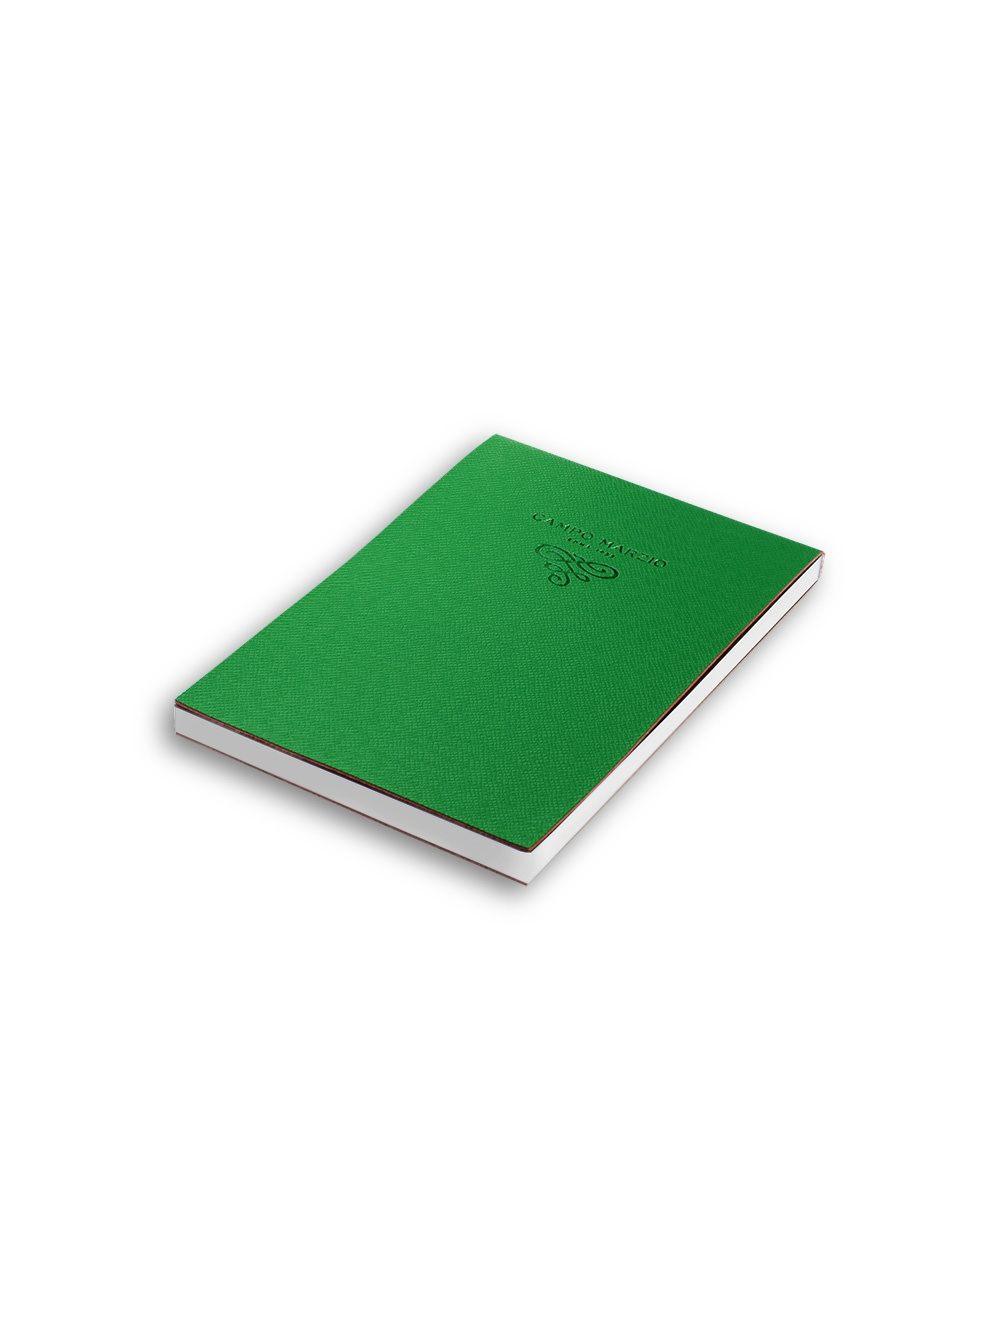 Notes 11x16 cm Saffiano (white internal paper) - Pine